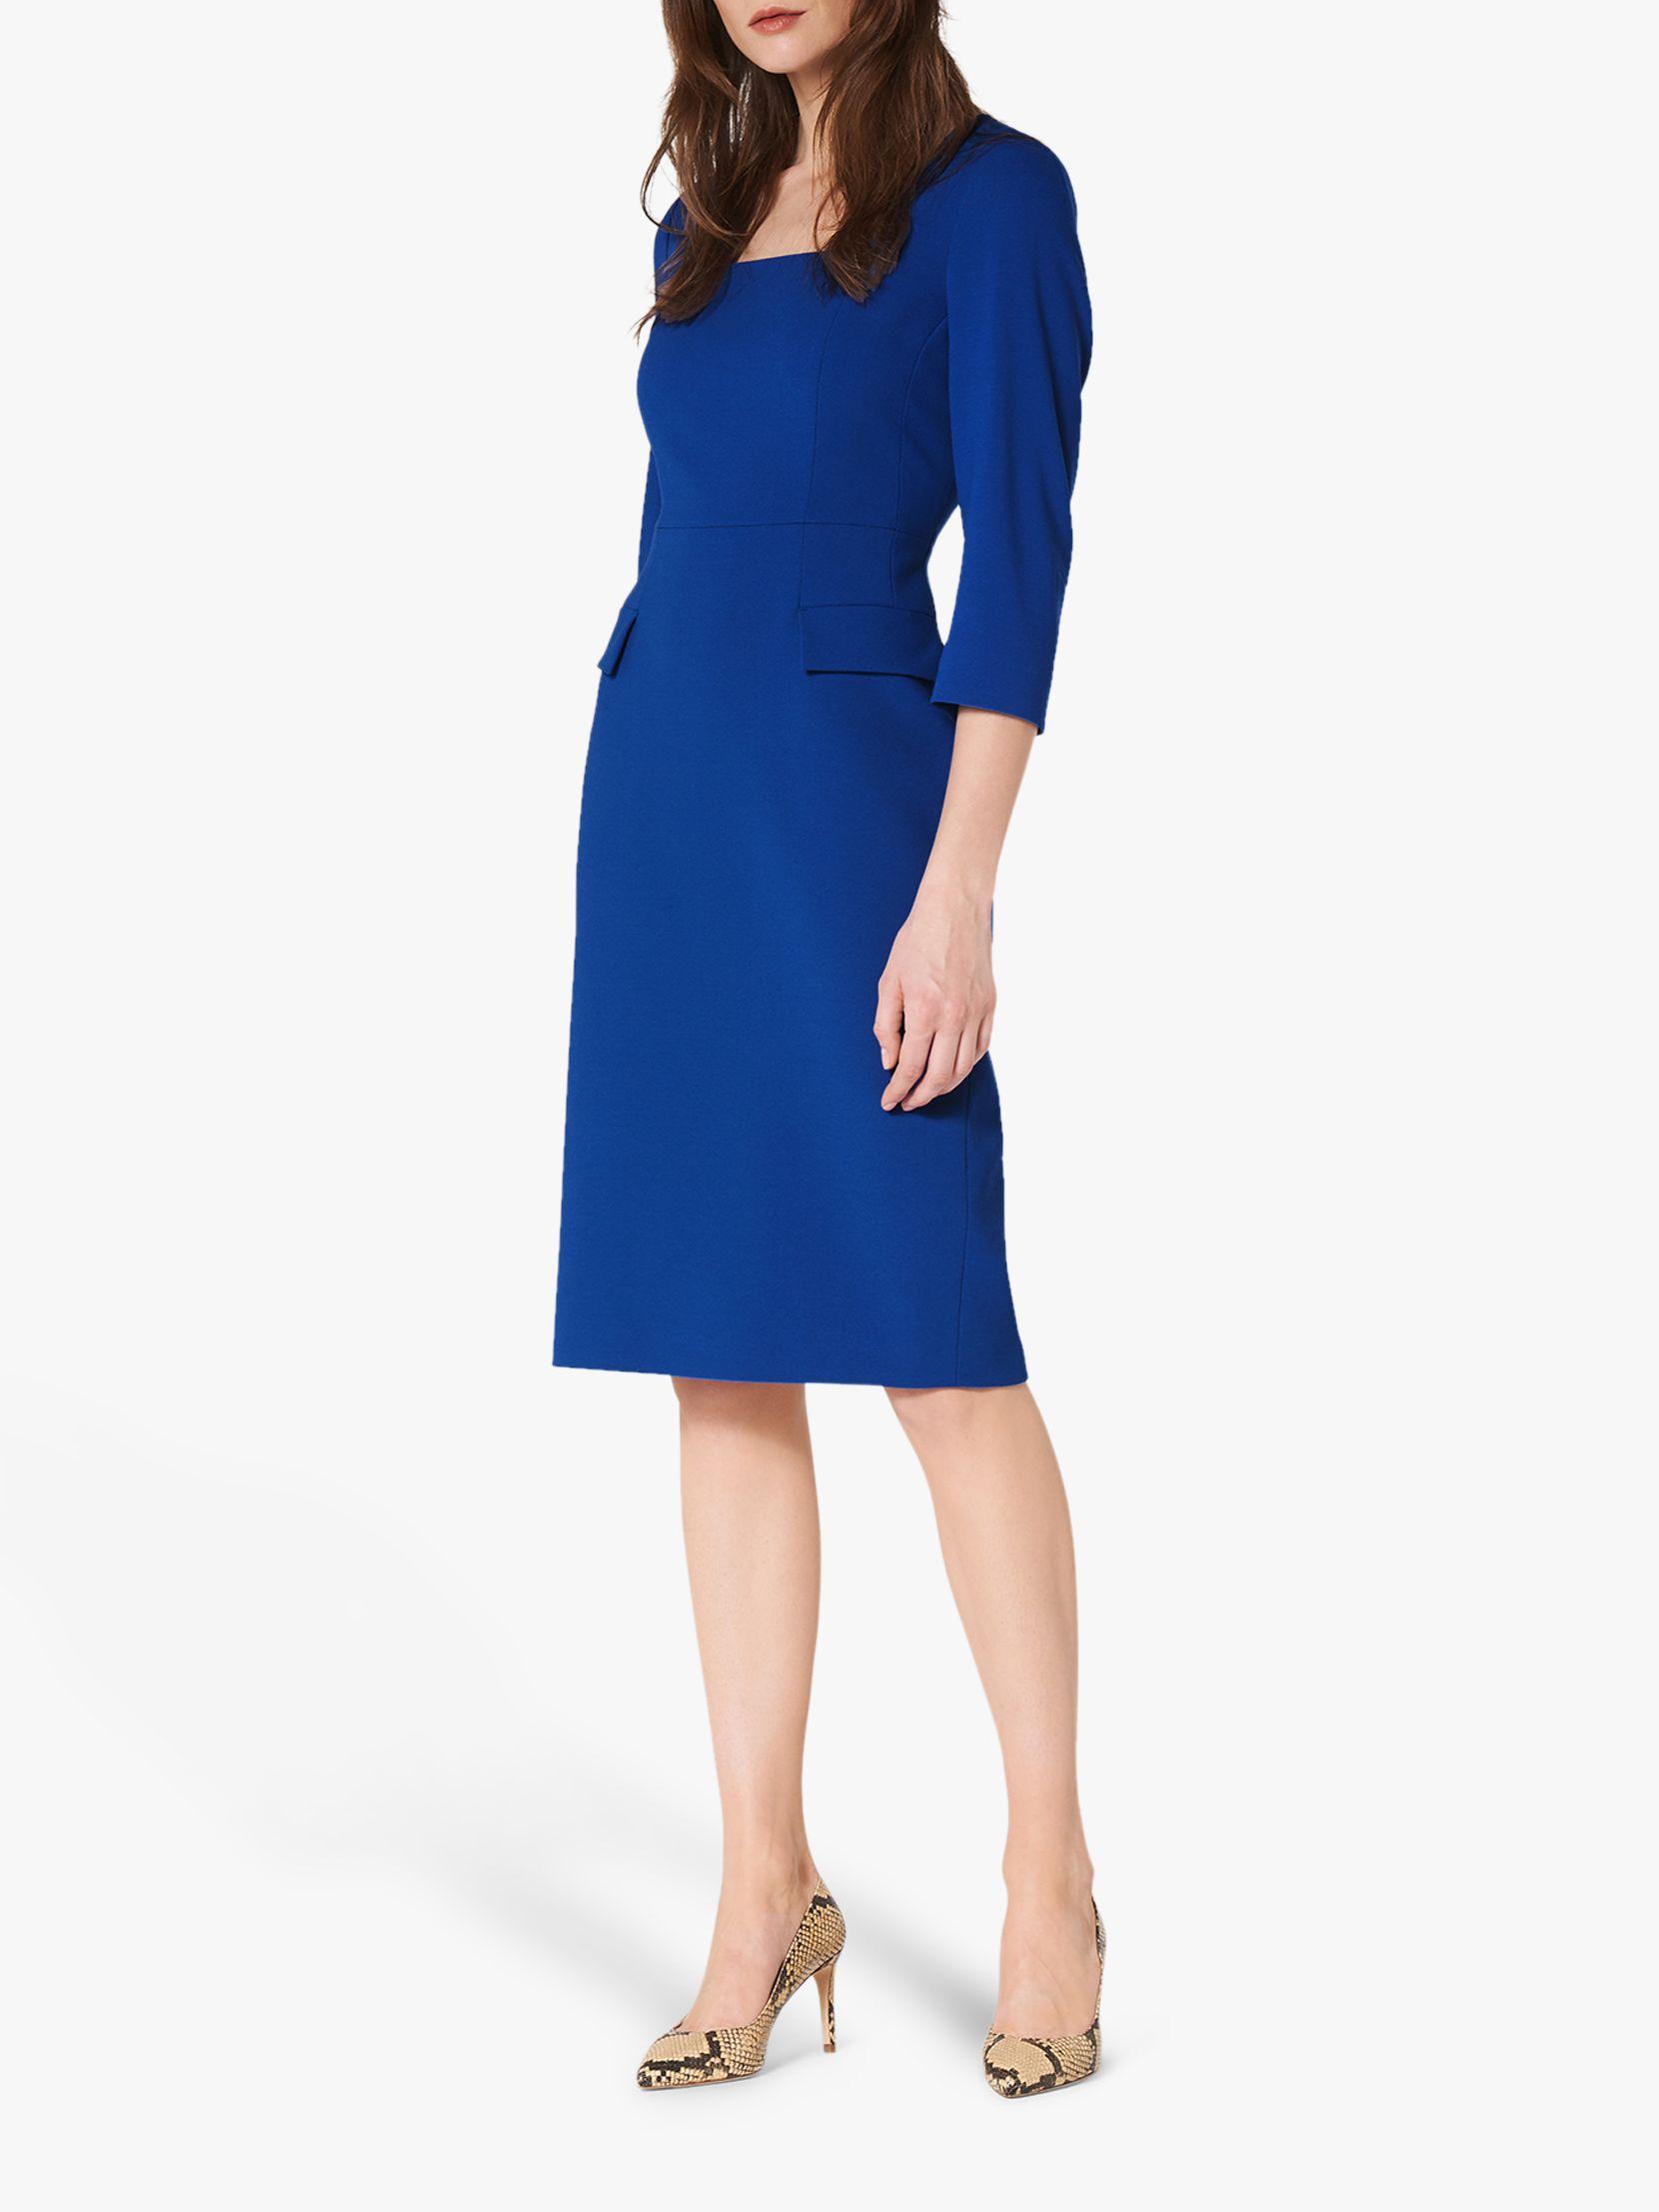 L K Bennett Ivor Pencil Dress Royal Blue At John Lewis Partners